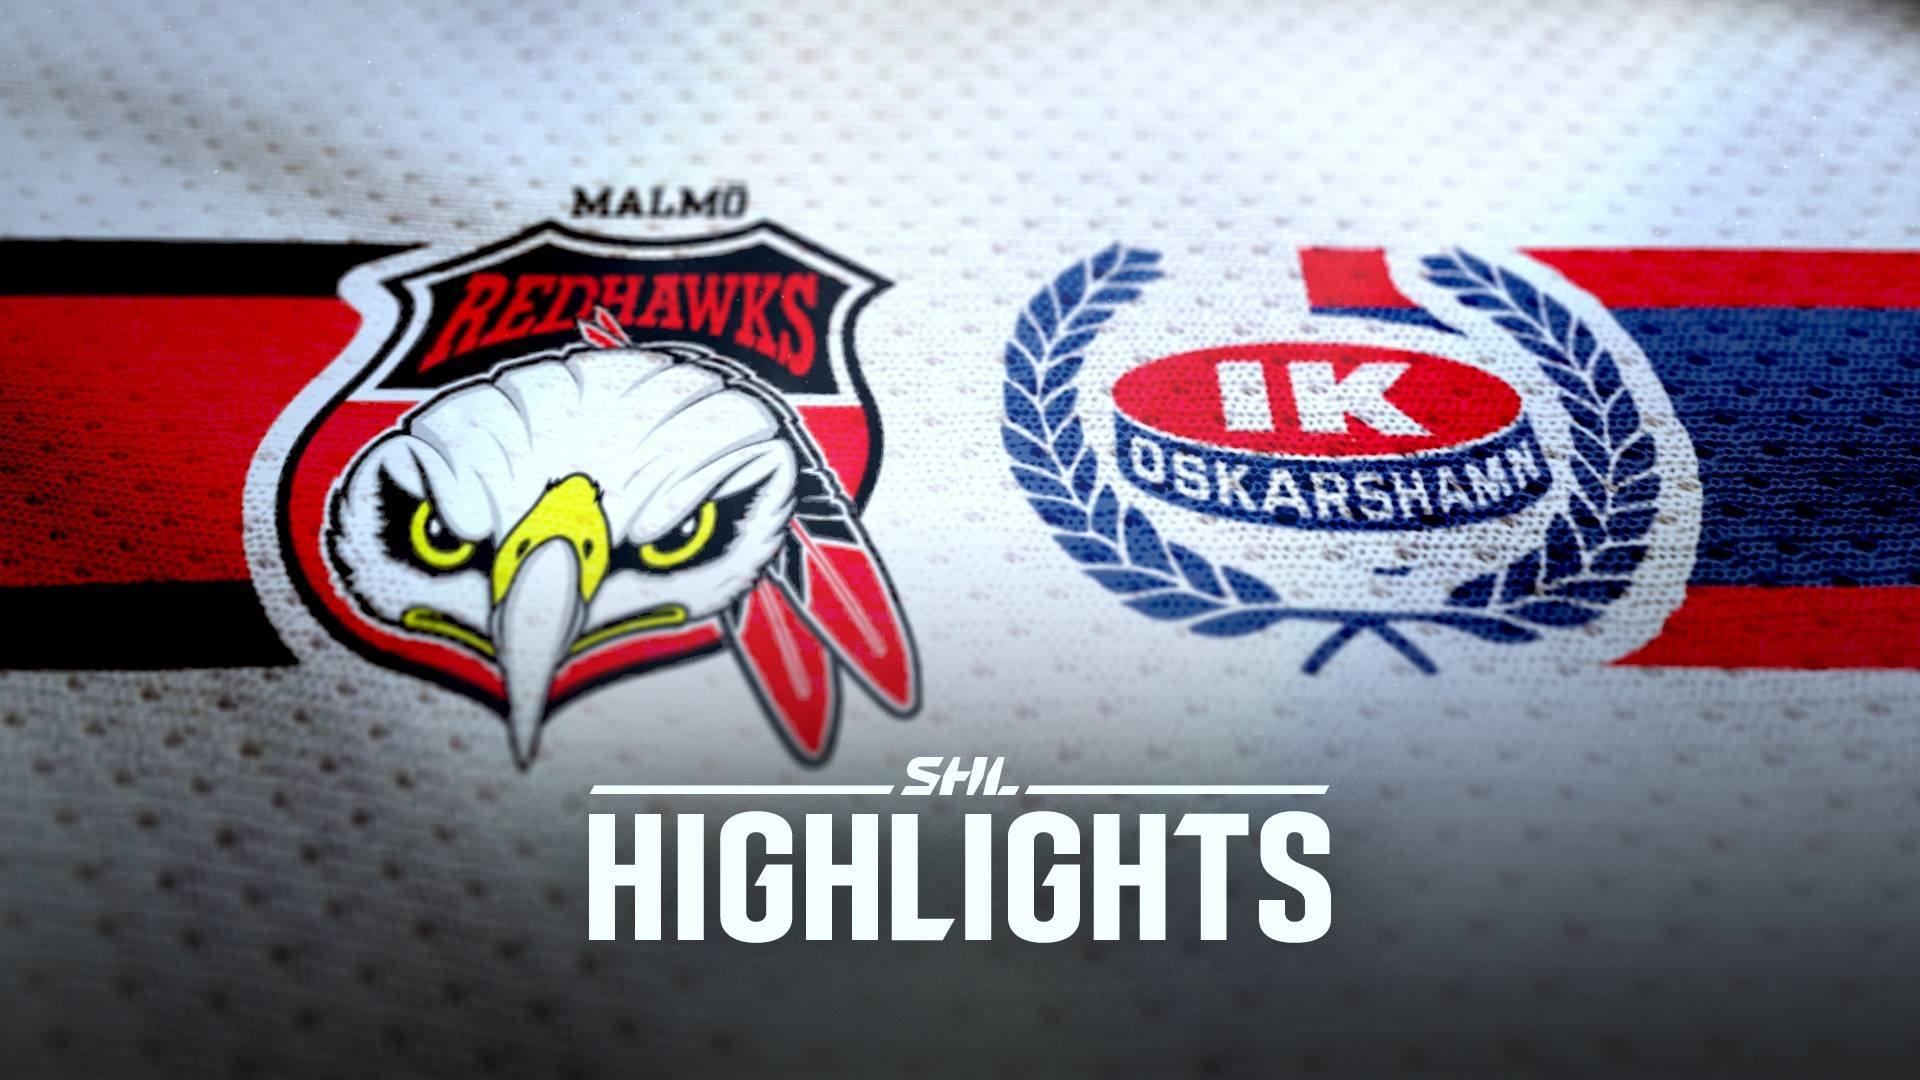 Malmö Redhawks - IK Oskarshamn